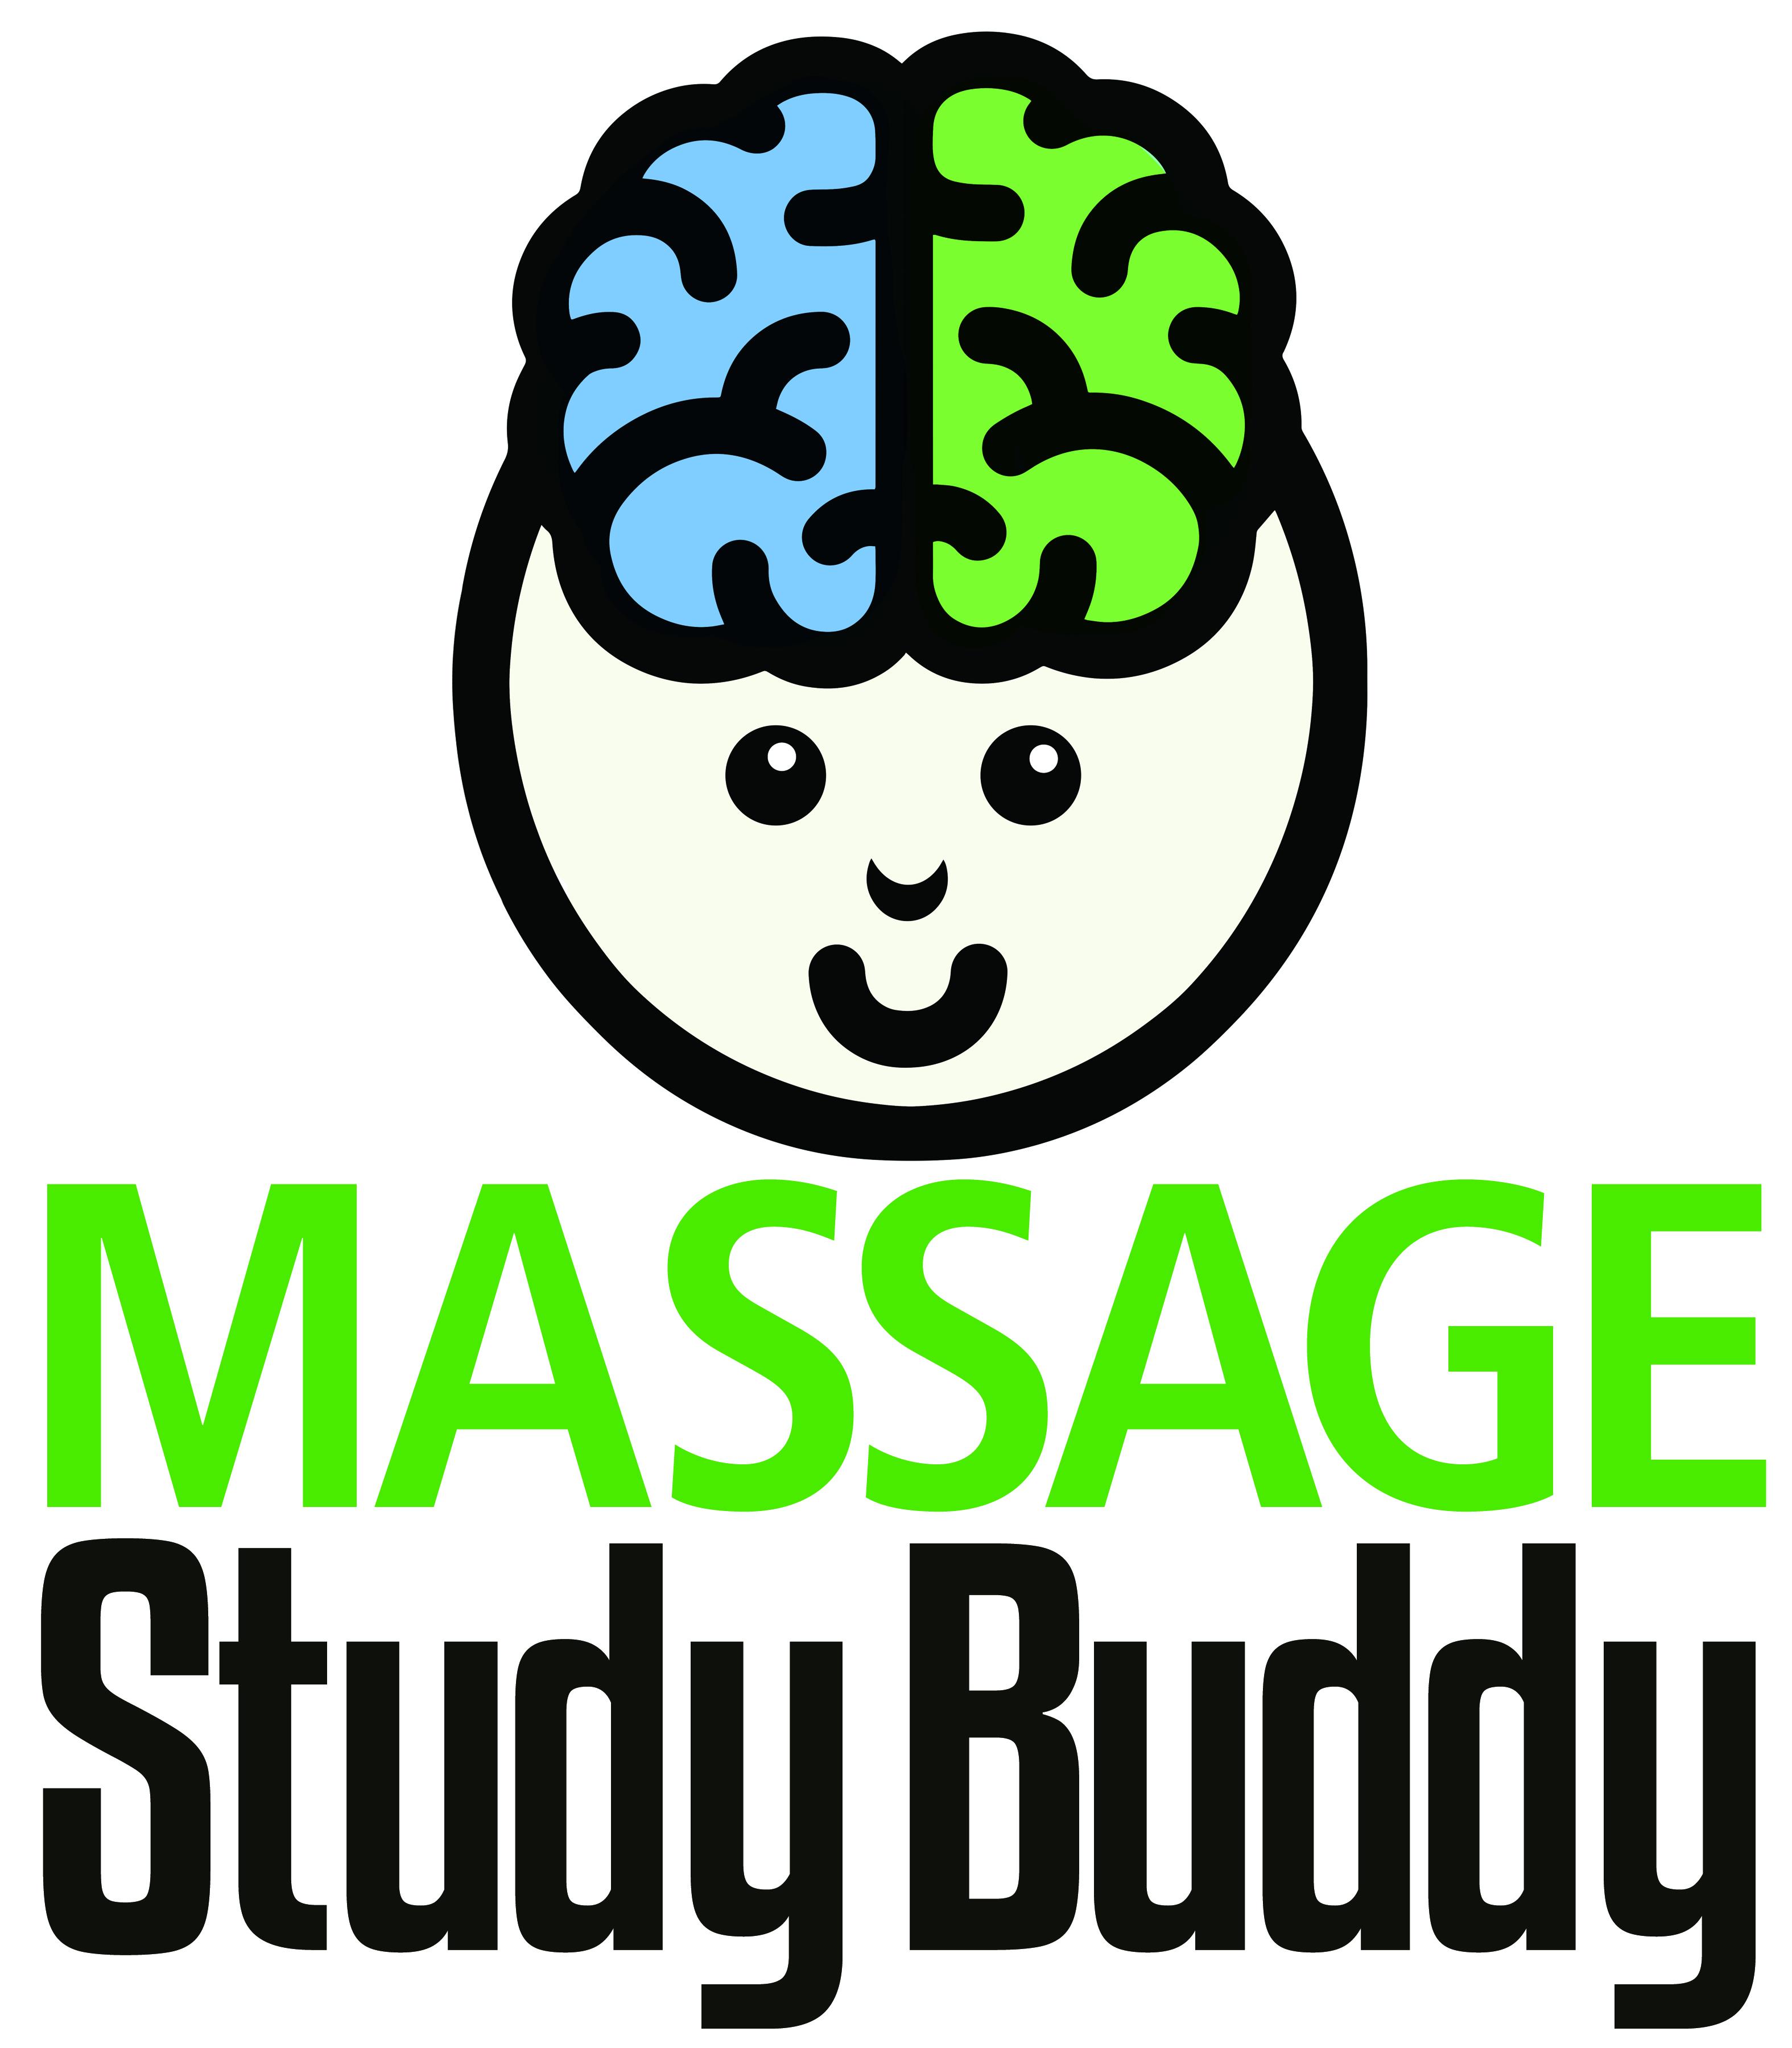 mblex test prep solution - massage study buddy